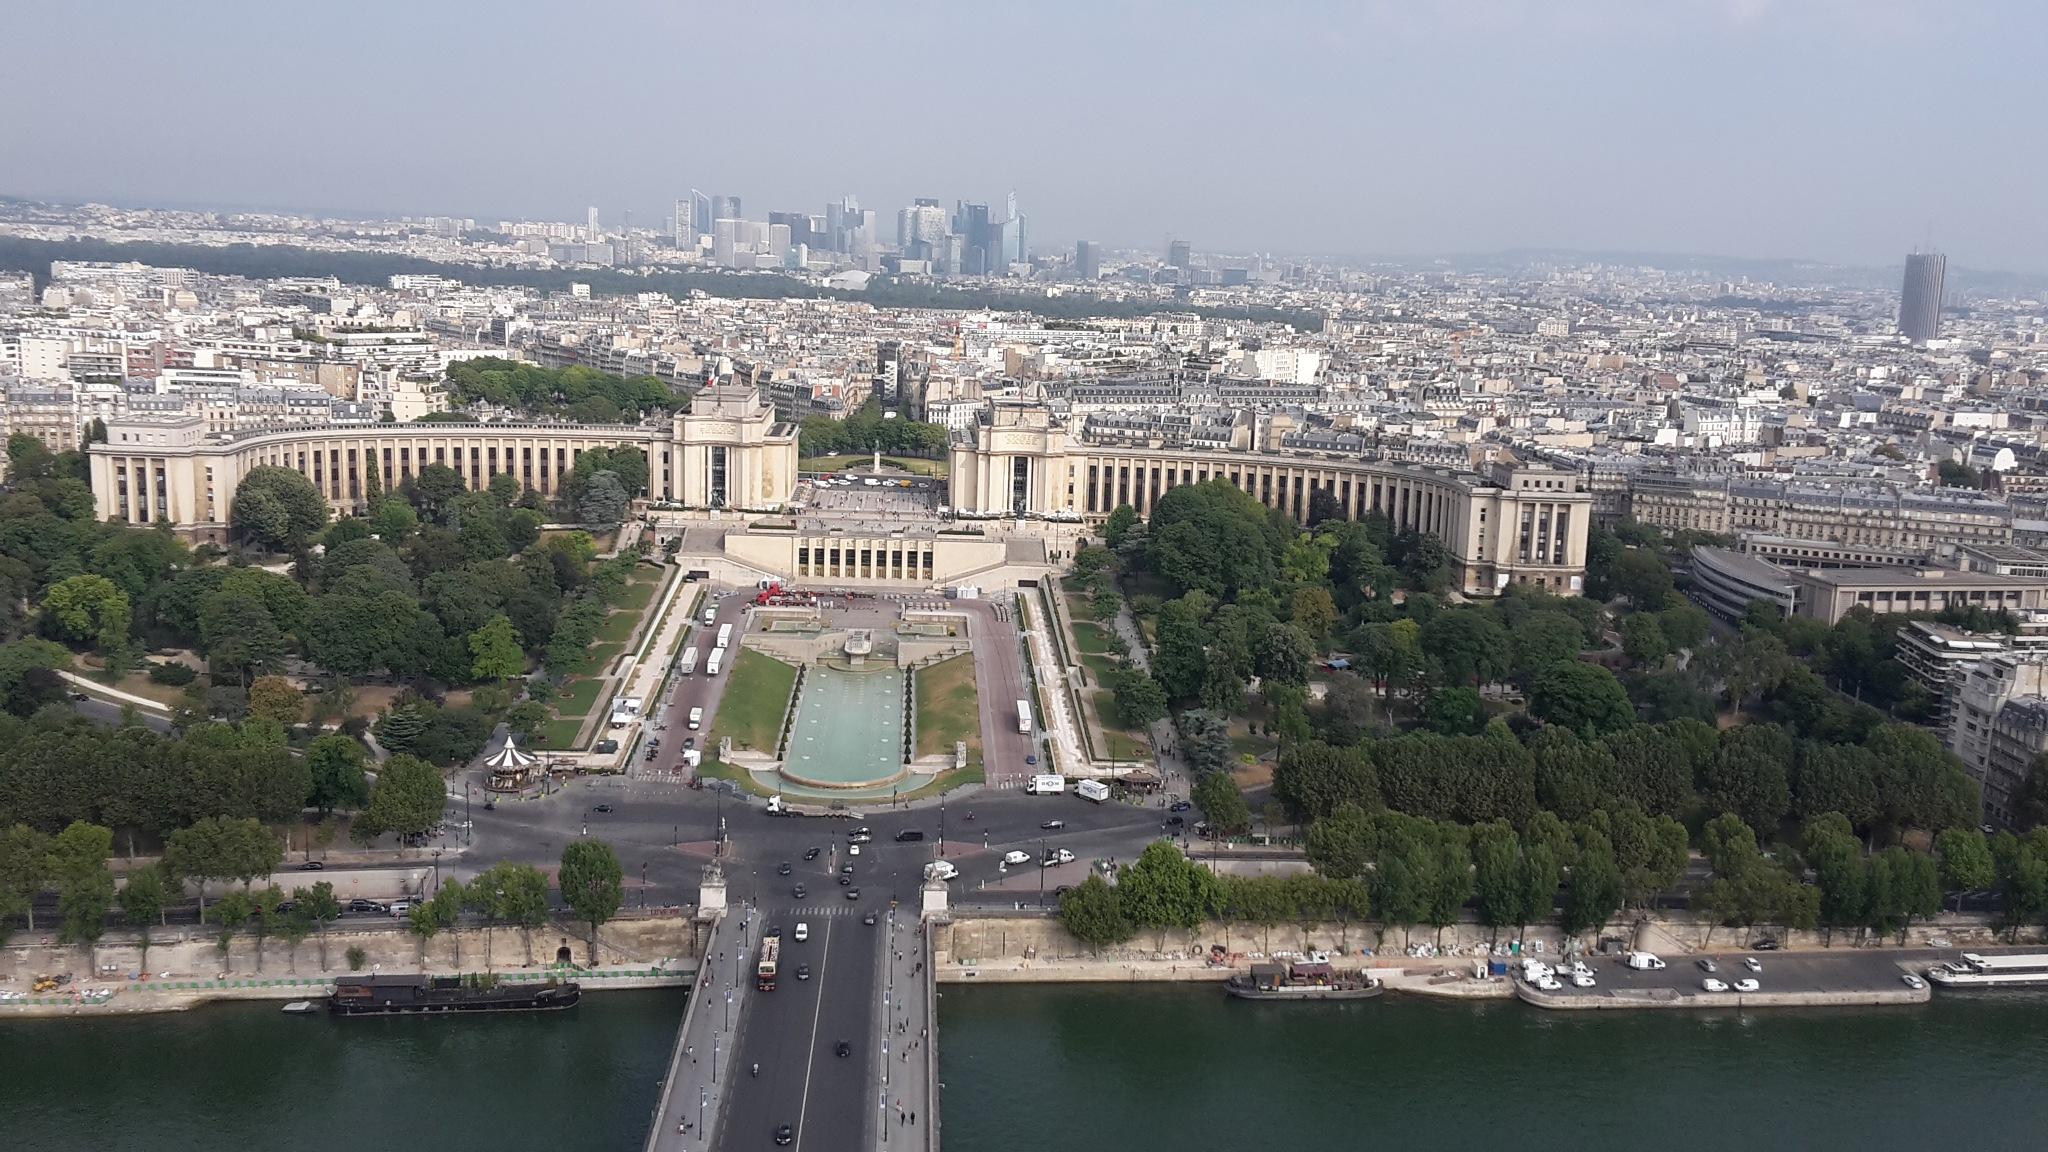 Paris by  robert pojedinec robert